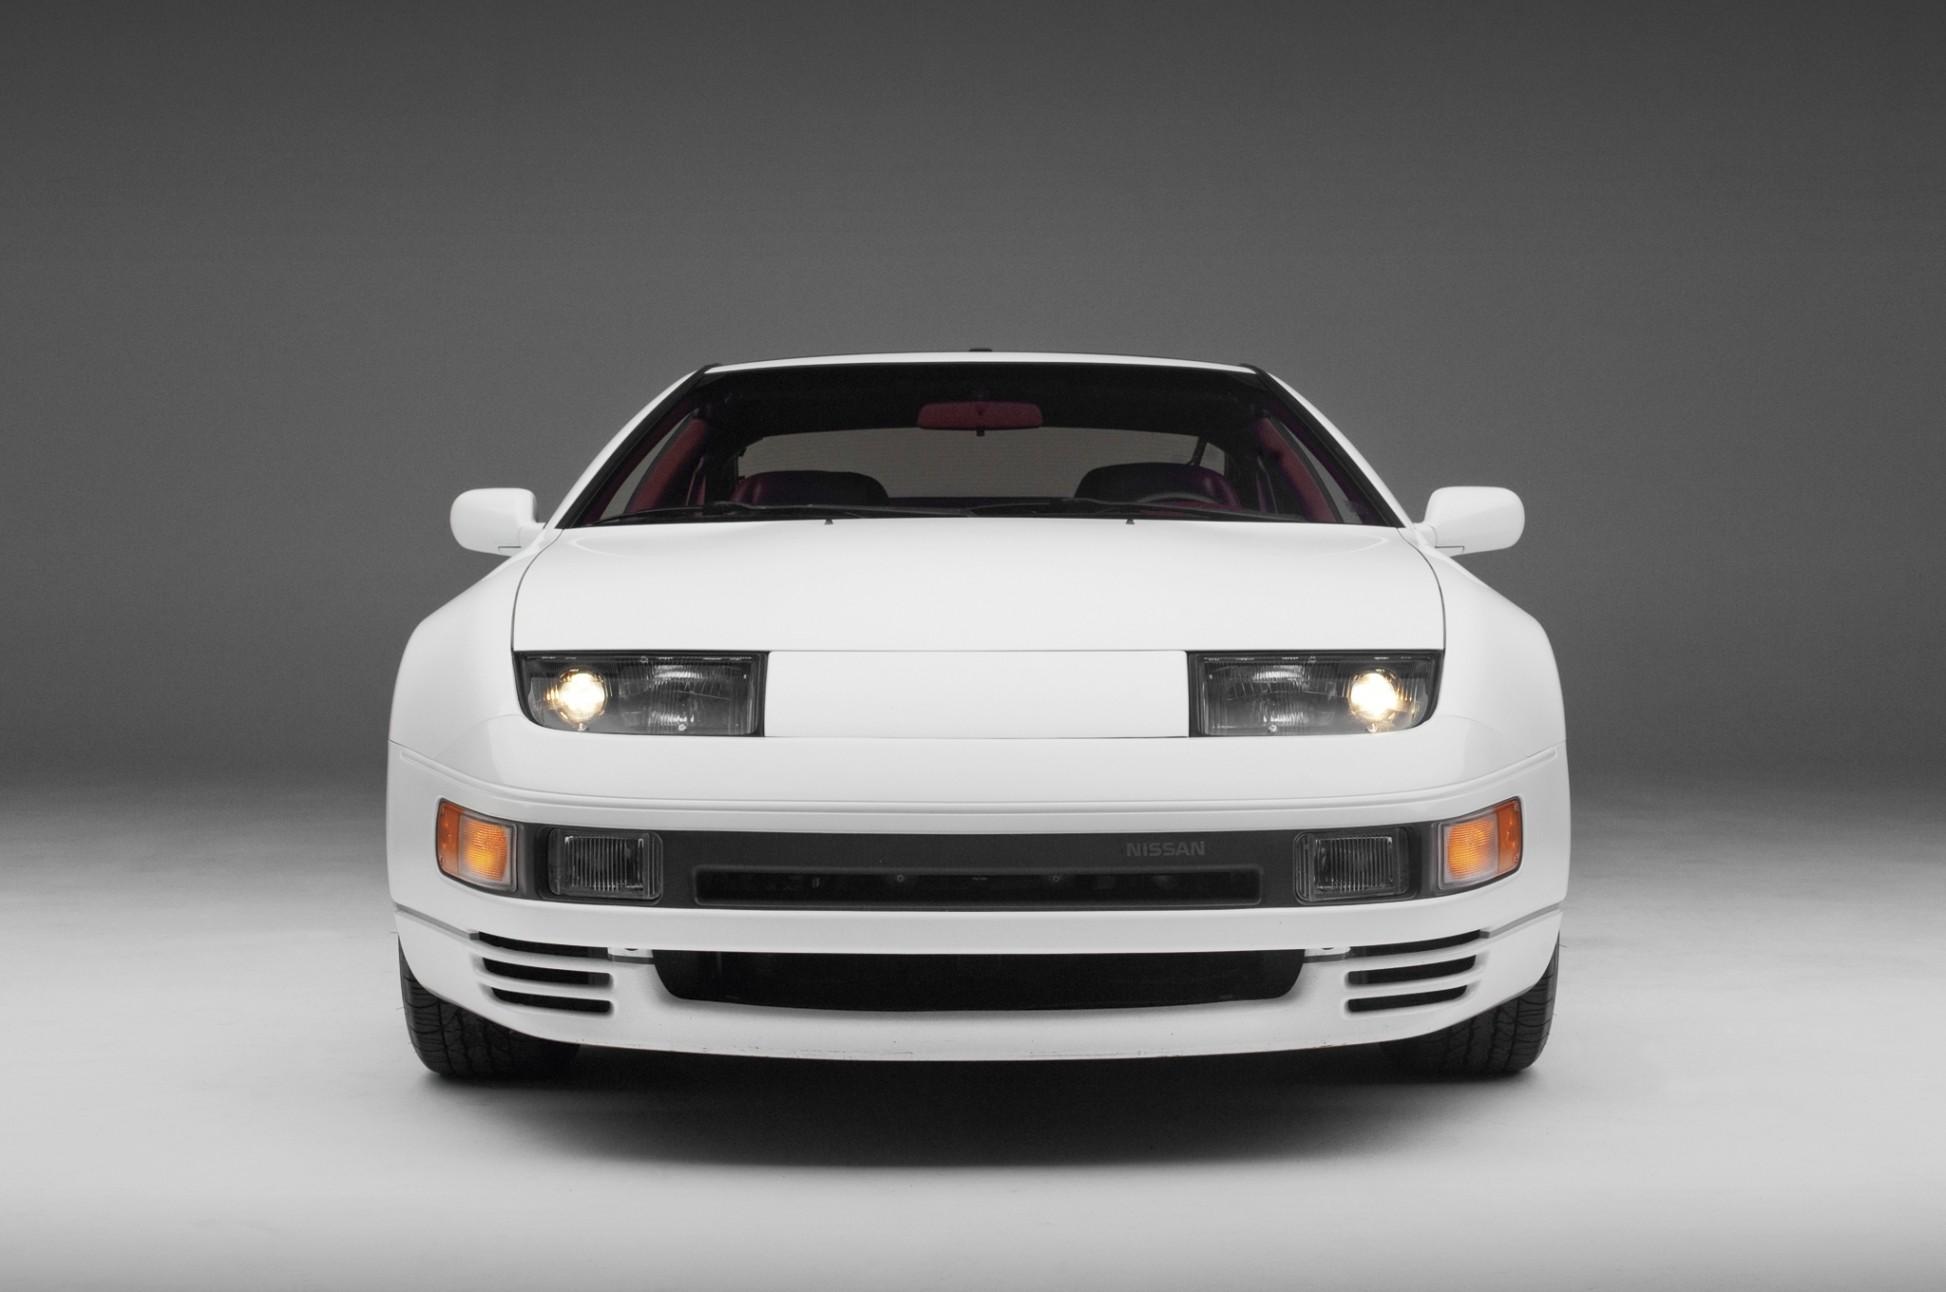 1990-1996 Nissan 300Zx Buyer's Guide – Motor Trend Classic